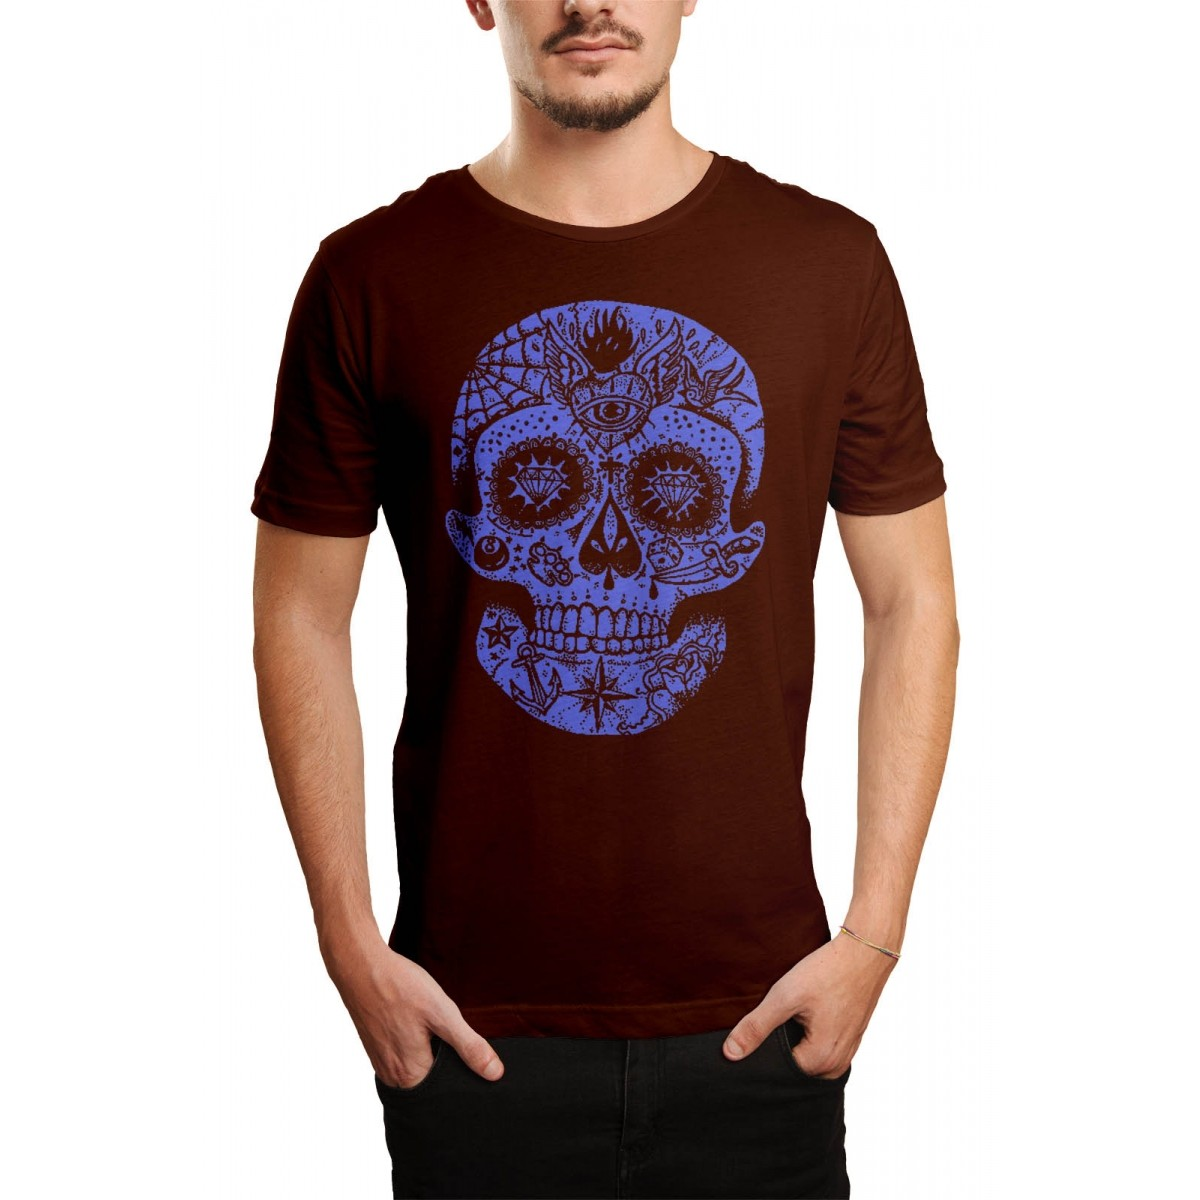 Camiseta HShop Caveira Mexicana Marrom  - HShop